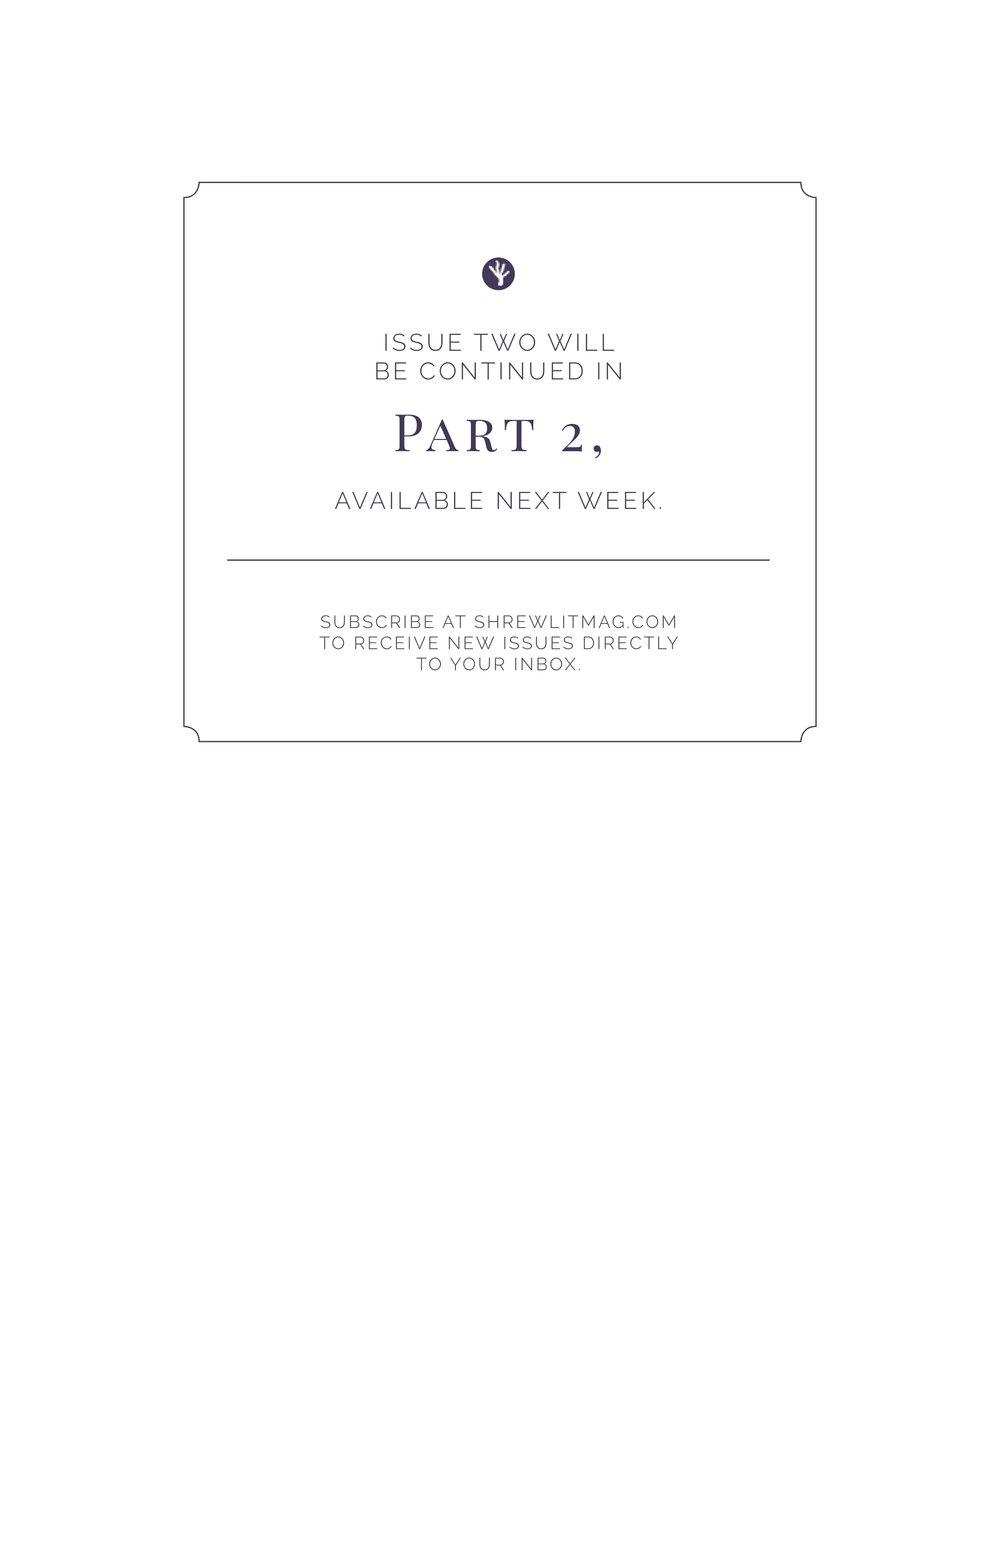 Shrew Issue 2 Part 1-13.jpg